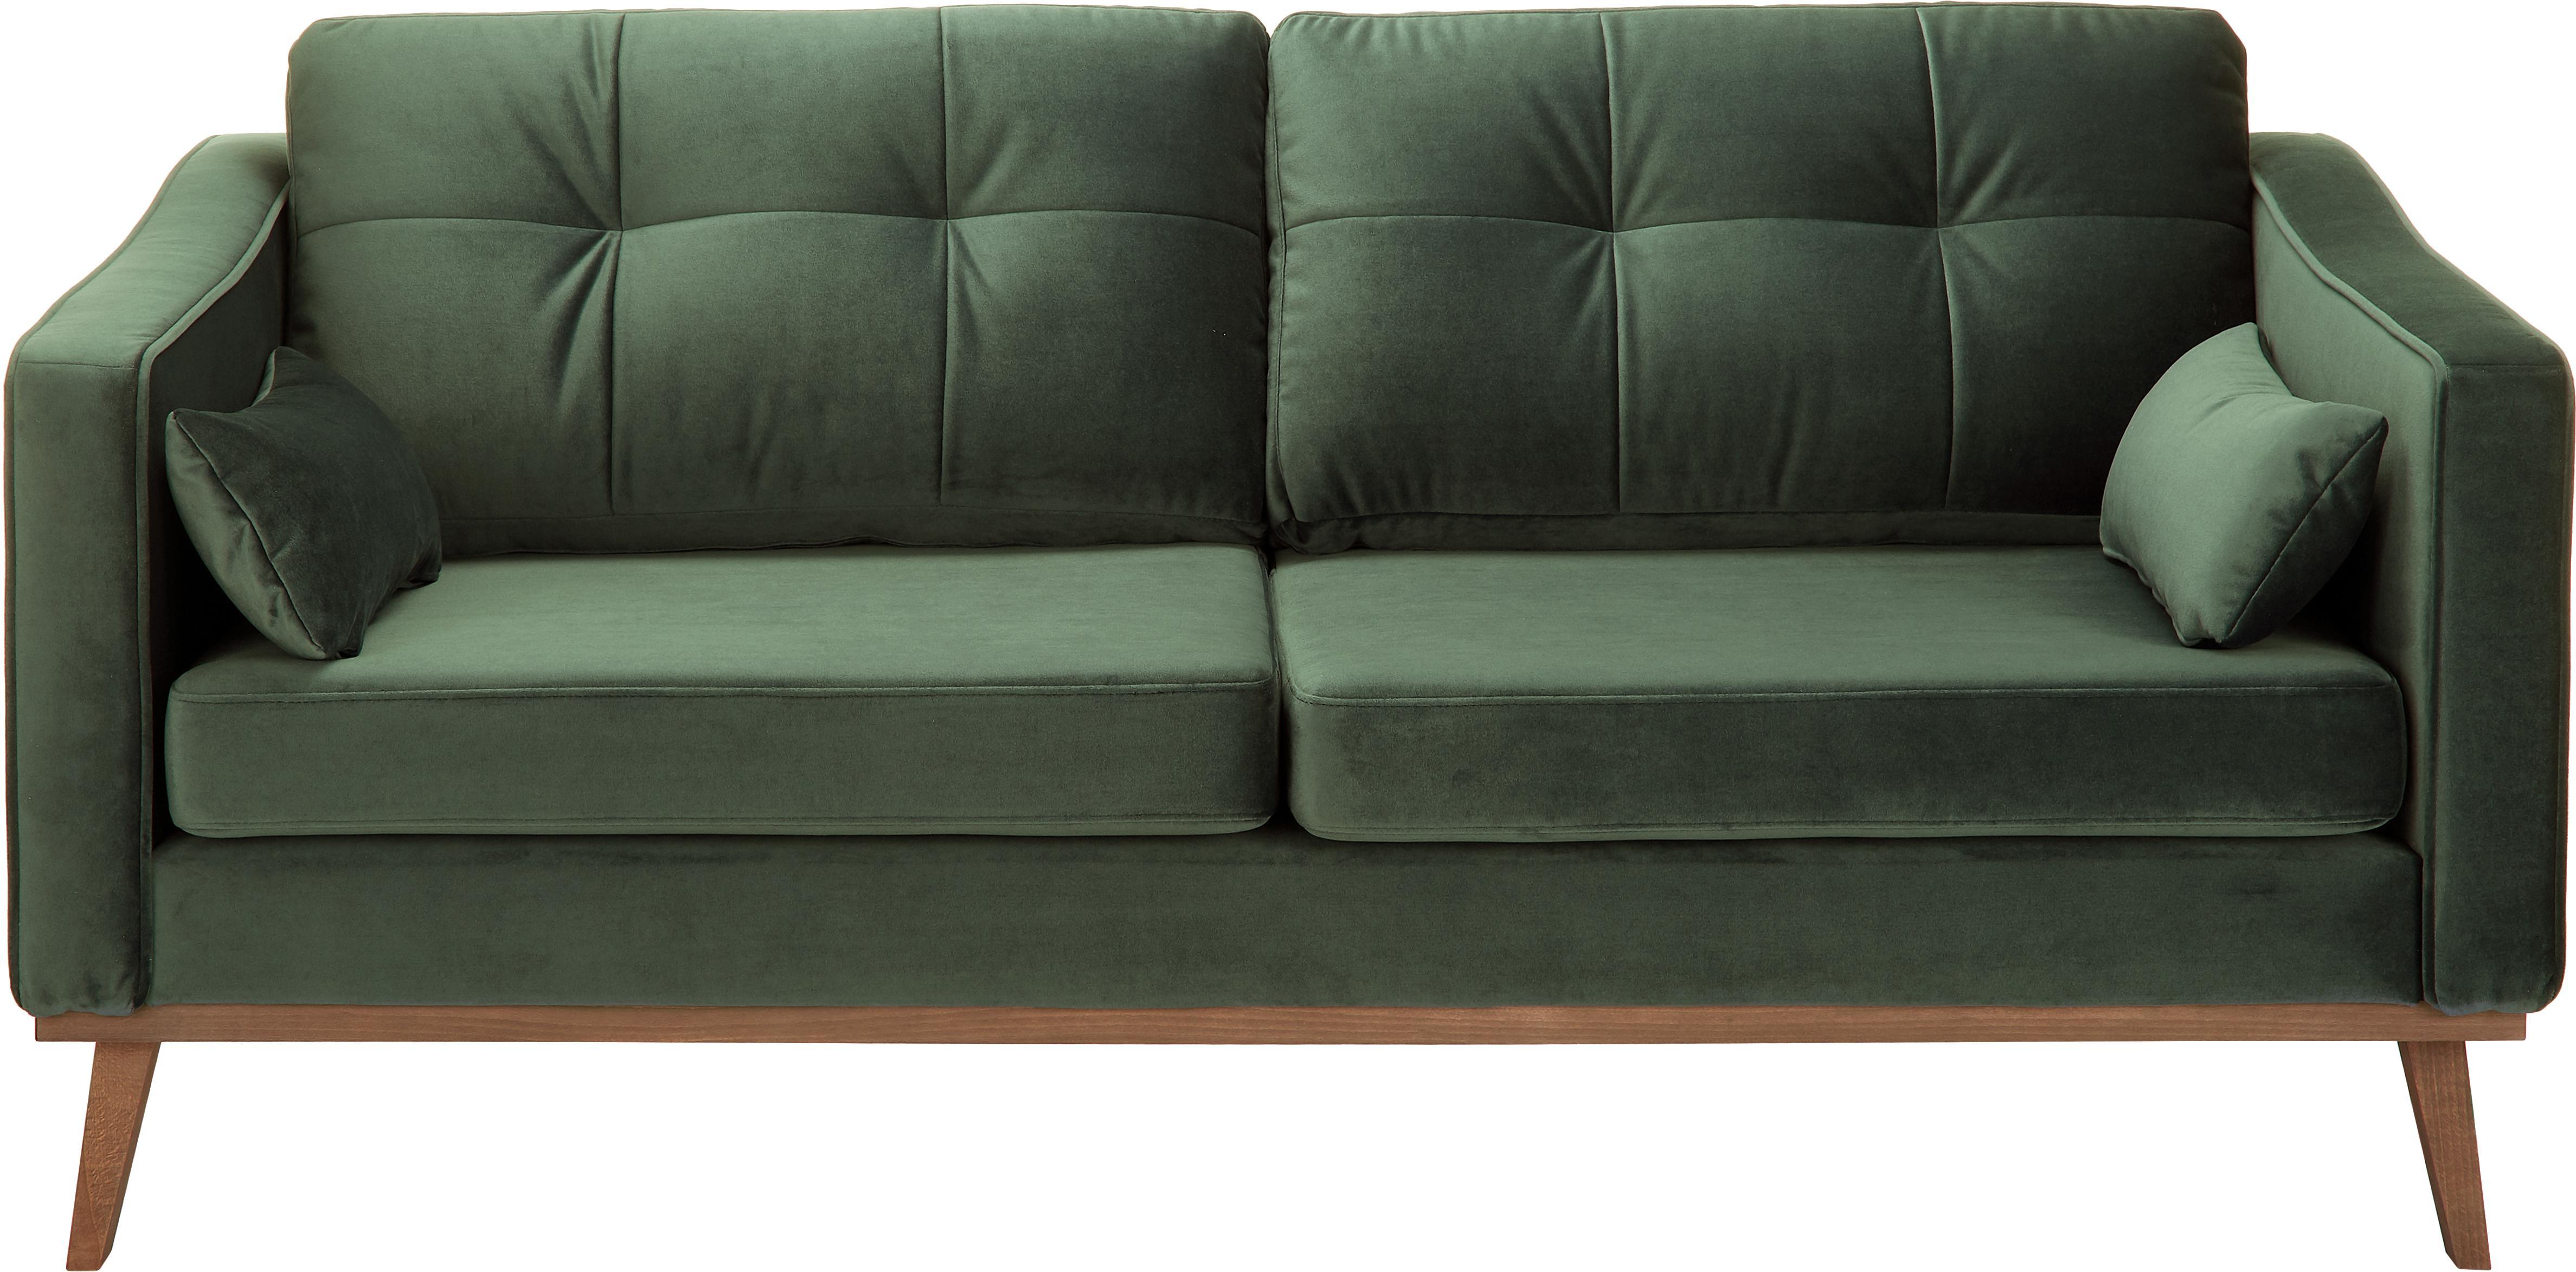 Samt-Sofa Alva (2-Sitzer), Bezug: Samt (Hochwertiger Polyes, Gestell: Massives Kiefernholz, Samt Olive, B 184 x T 92 cm